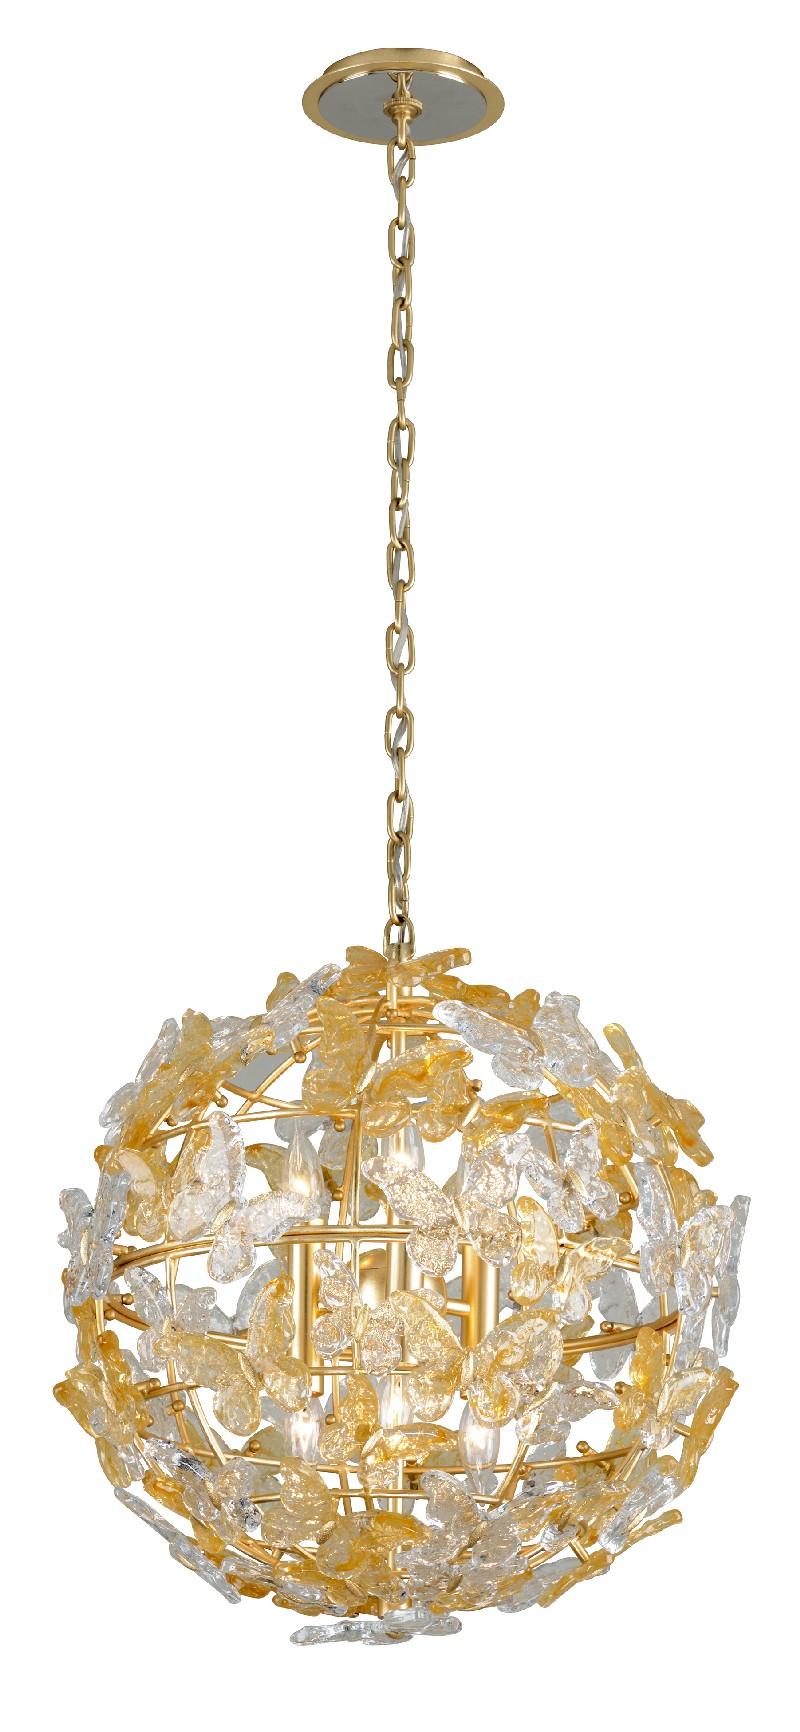 Hudson Valley Lighting Group Debuts Collection At Maison et Objet 2019 #covetedmagazine #interiordesign #homedecor #maisonetobjet2019 #designtrends #covetawards #luxurybrands #craftsmanship ➤ www.covetedition.com ➤ @covetedmagazine @bocadolobo @delightfulll @brabbu @essentialhomeeu @circudesign @mvalentinabath @luxxu @covethouse_ @rug_society @pullcast_jewelryhardware @byfoogo